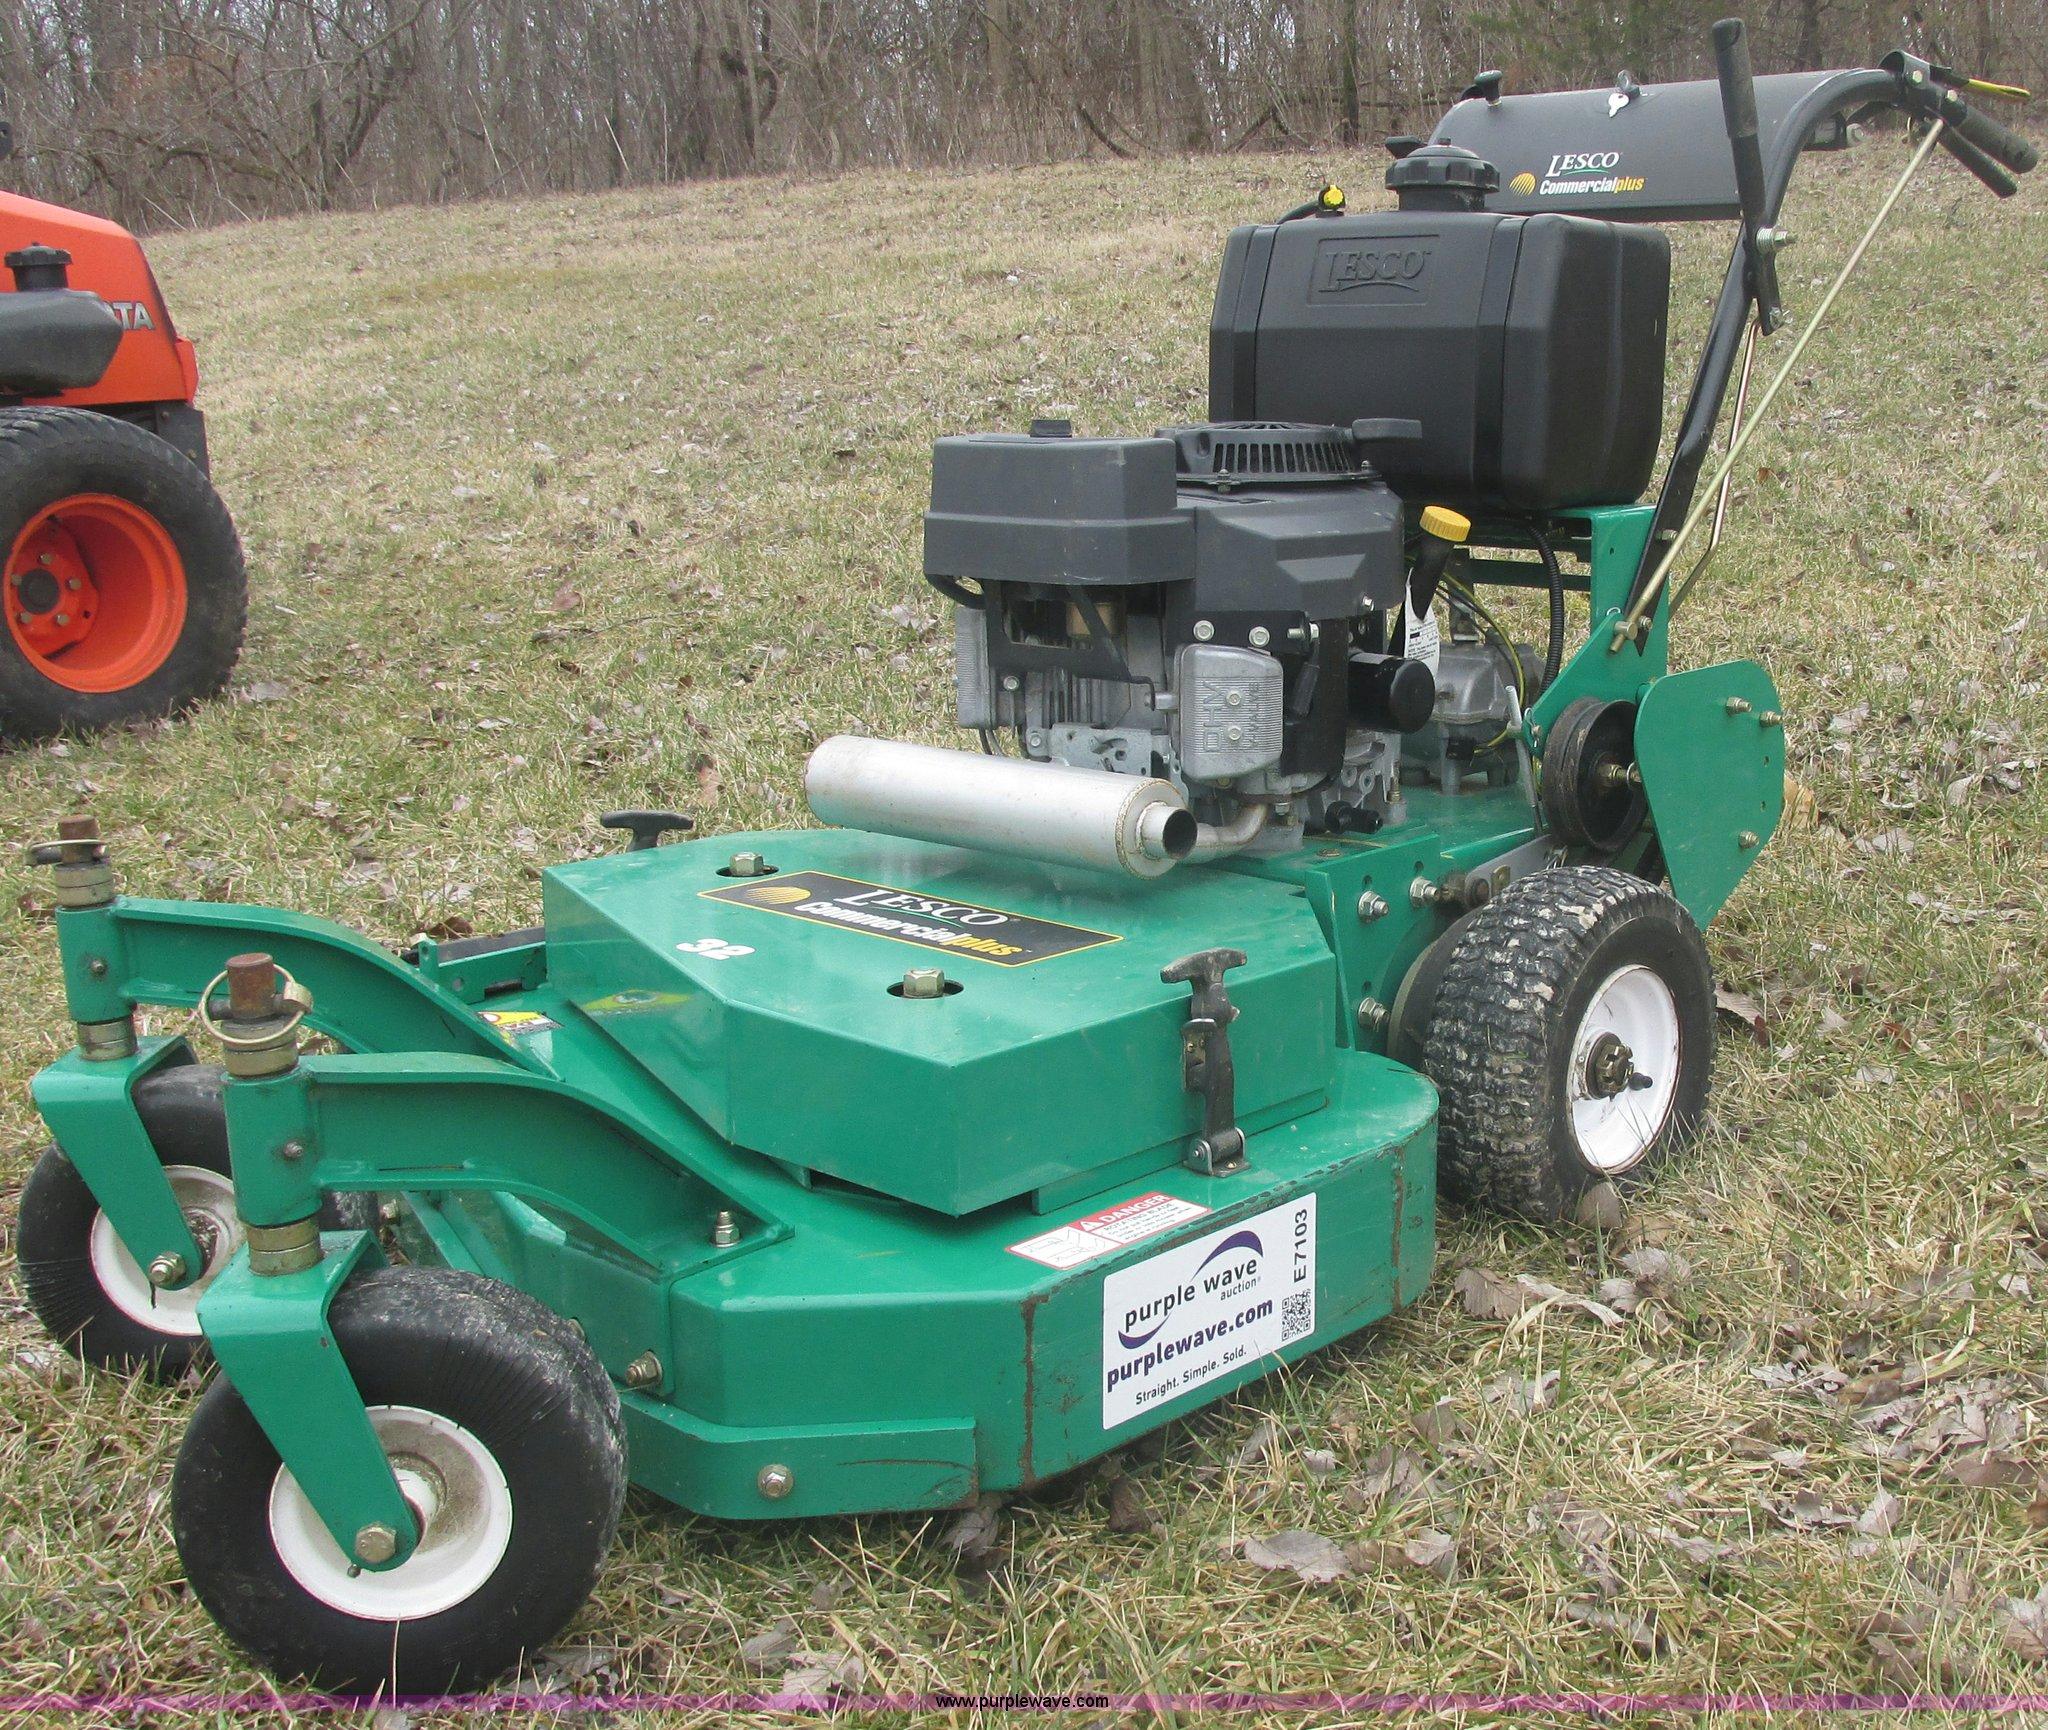 E7103 image for item E7103 Lesco walk-behind lawn mower